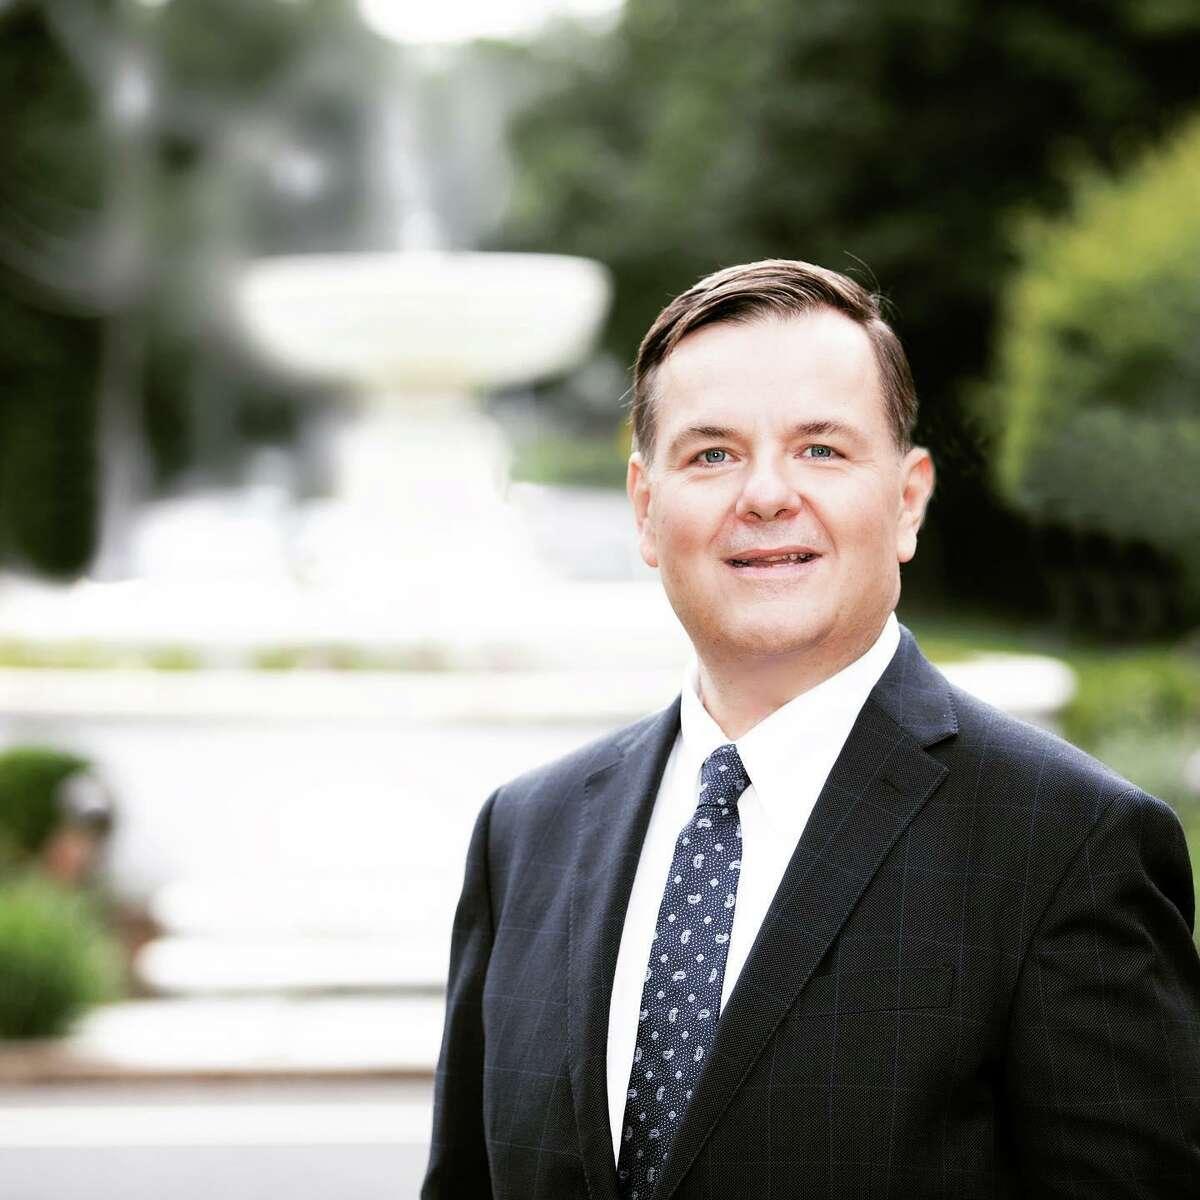 State Rep. John Frey